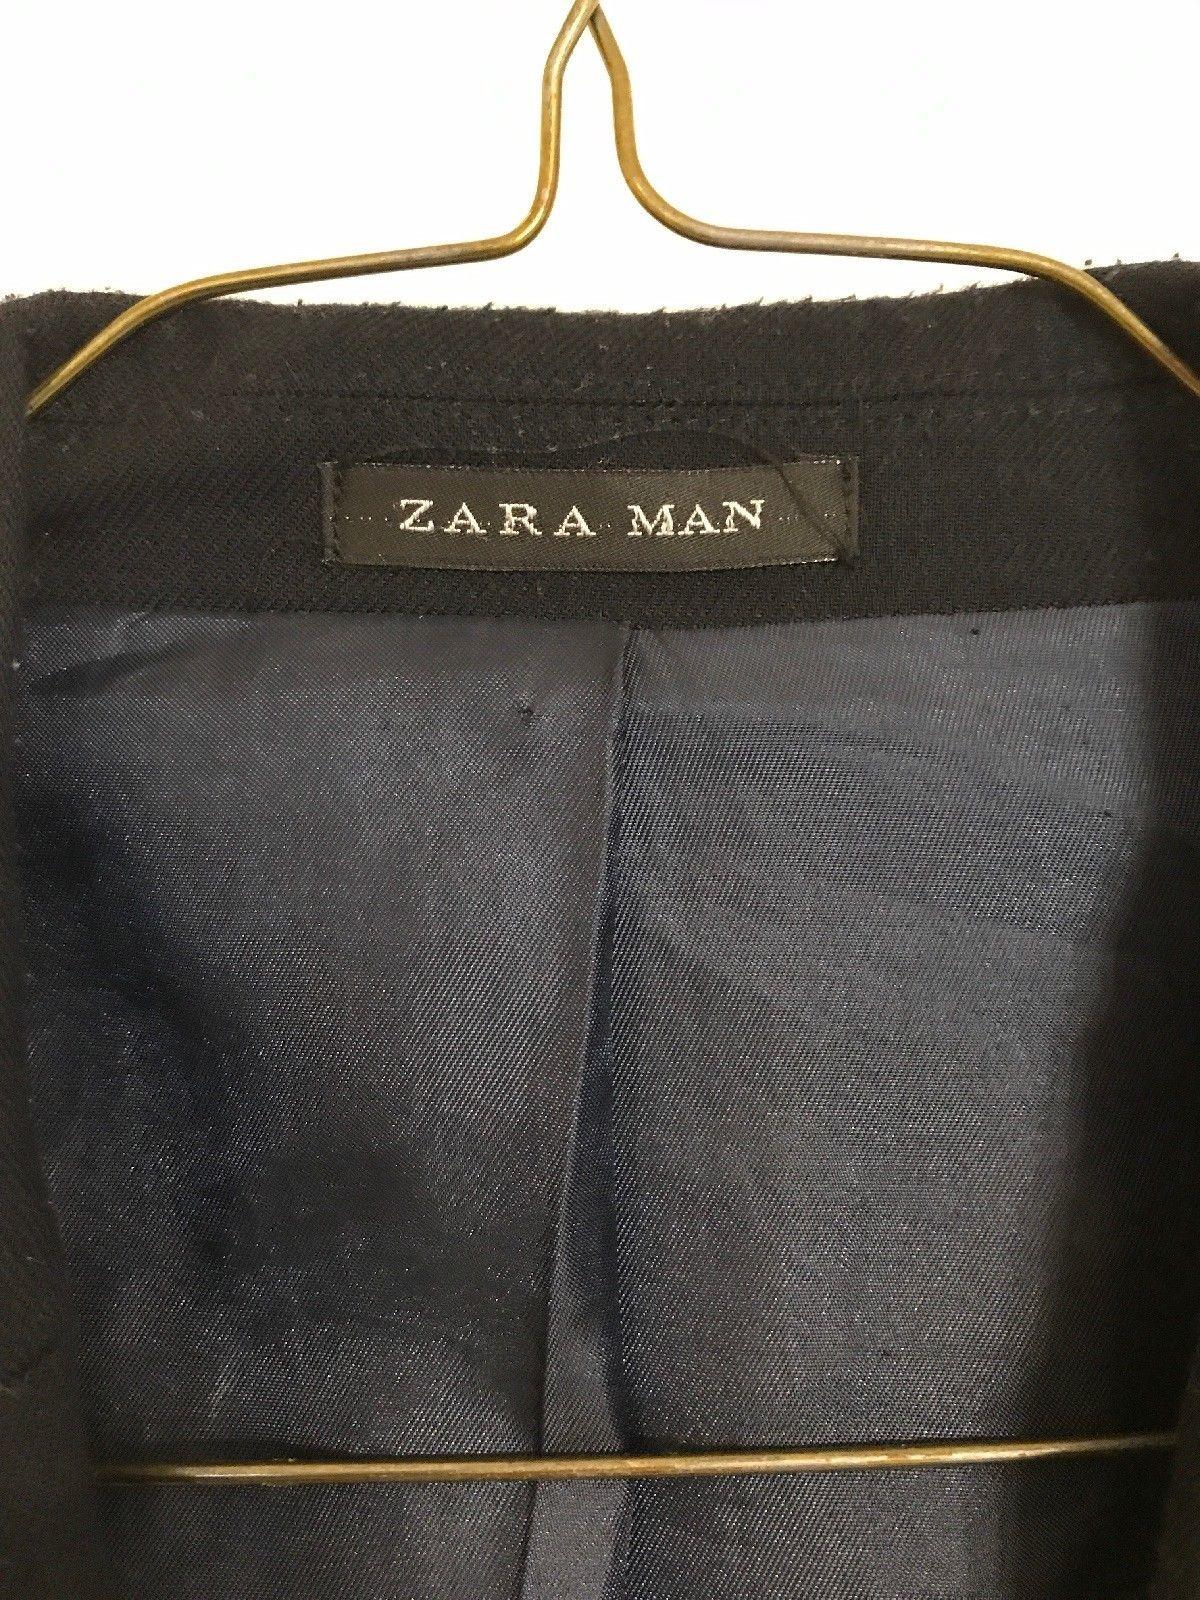 Black Tag by Zara Man Dark Blue Sport Jacket Blazer Brown Elbow Patch 44